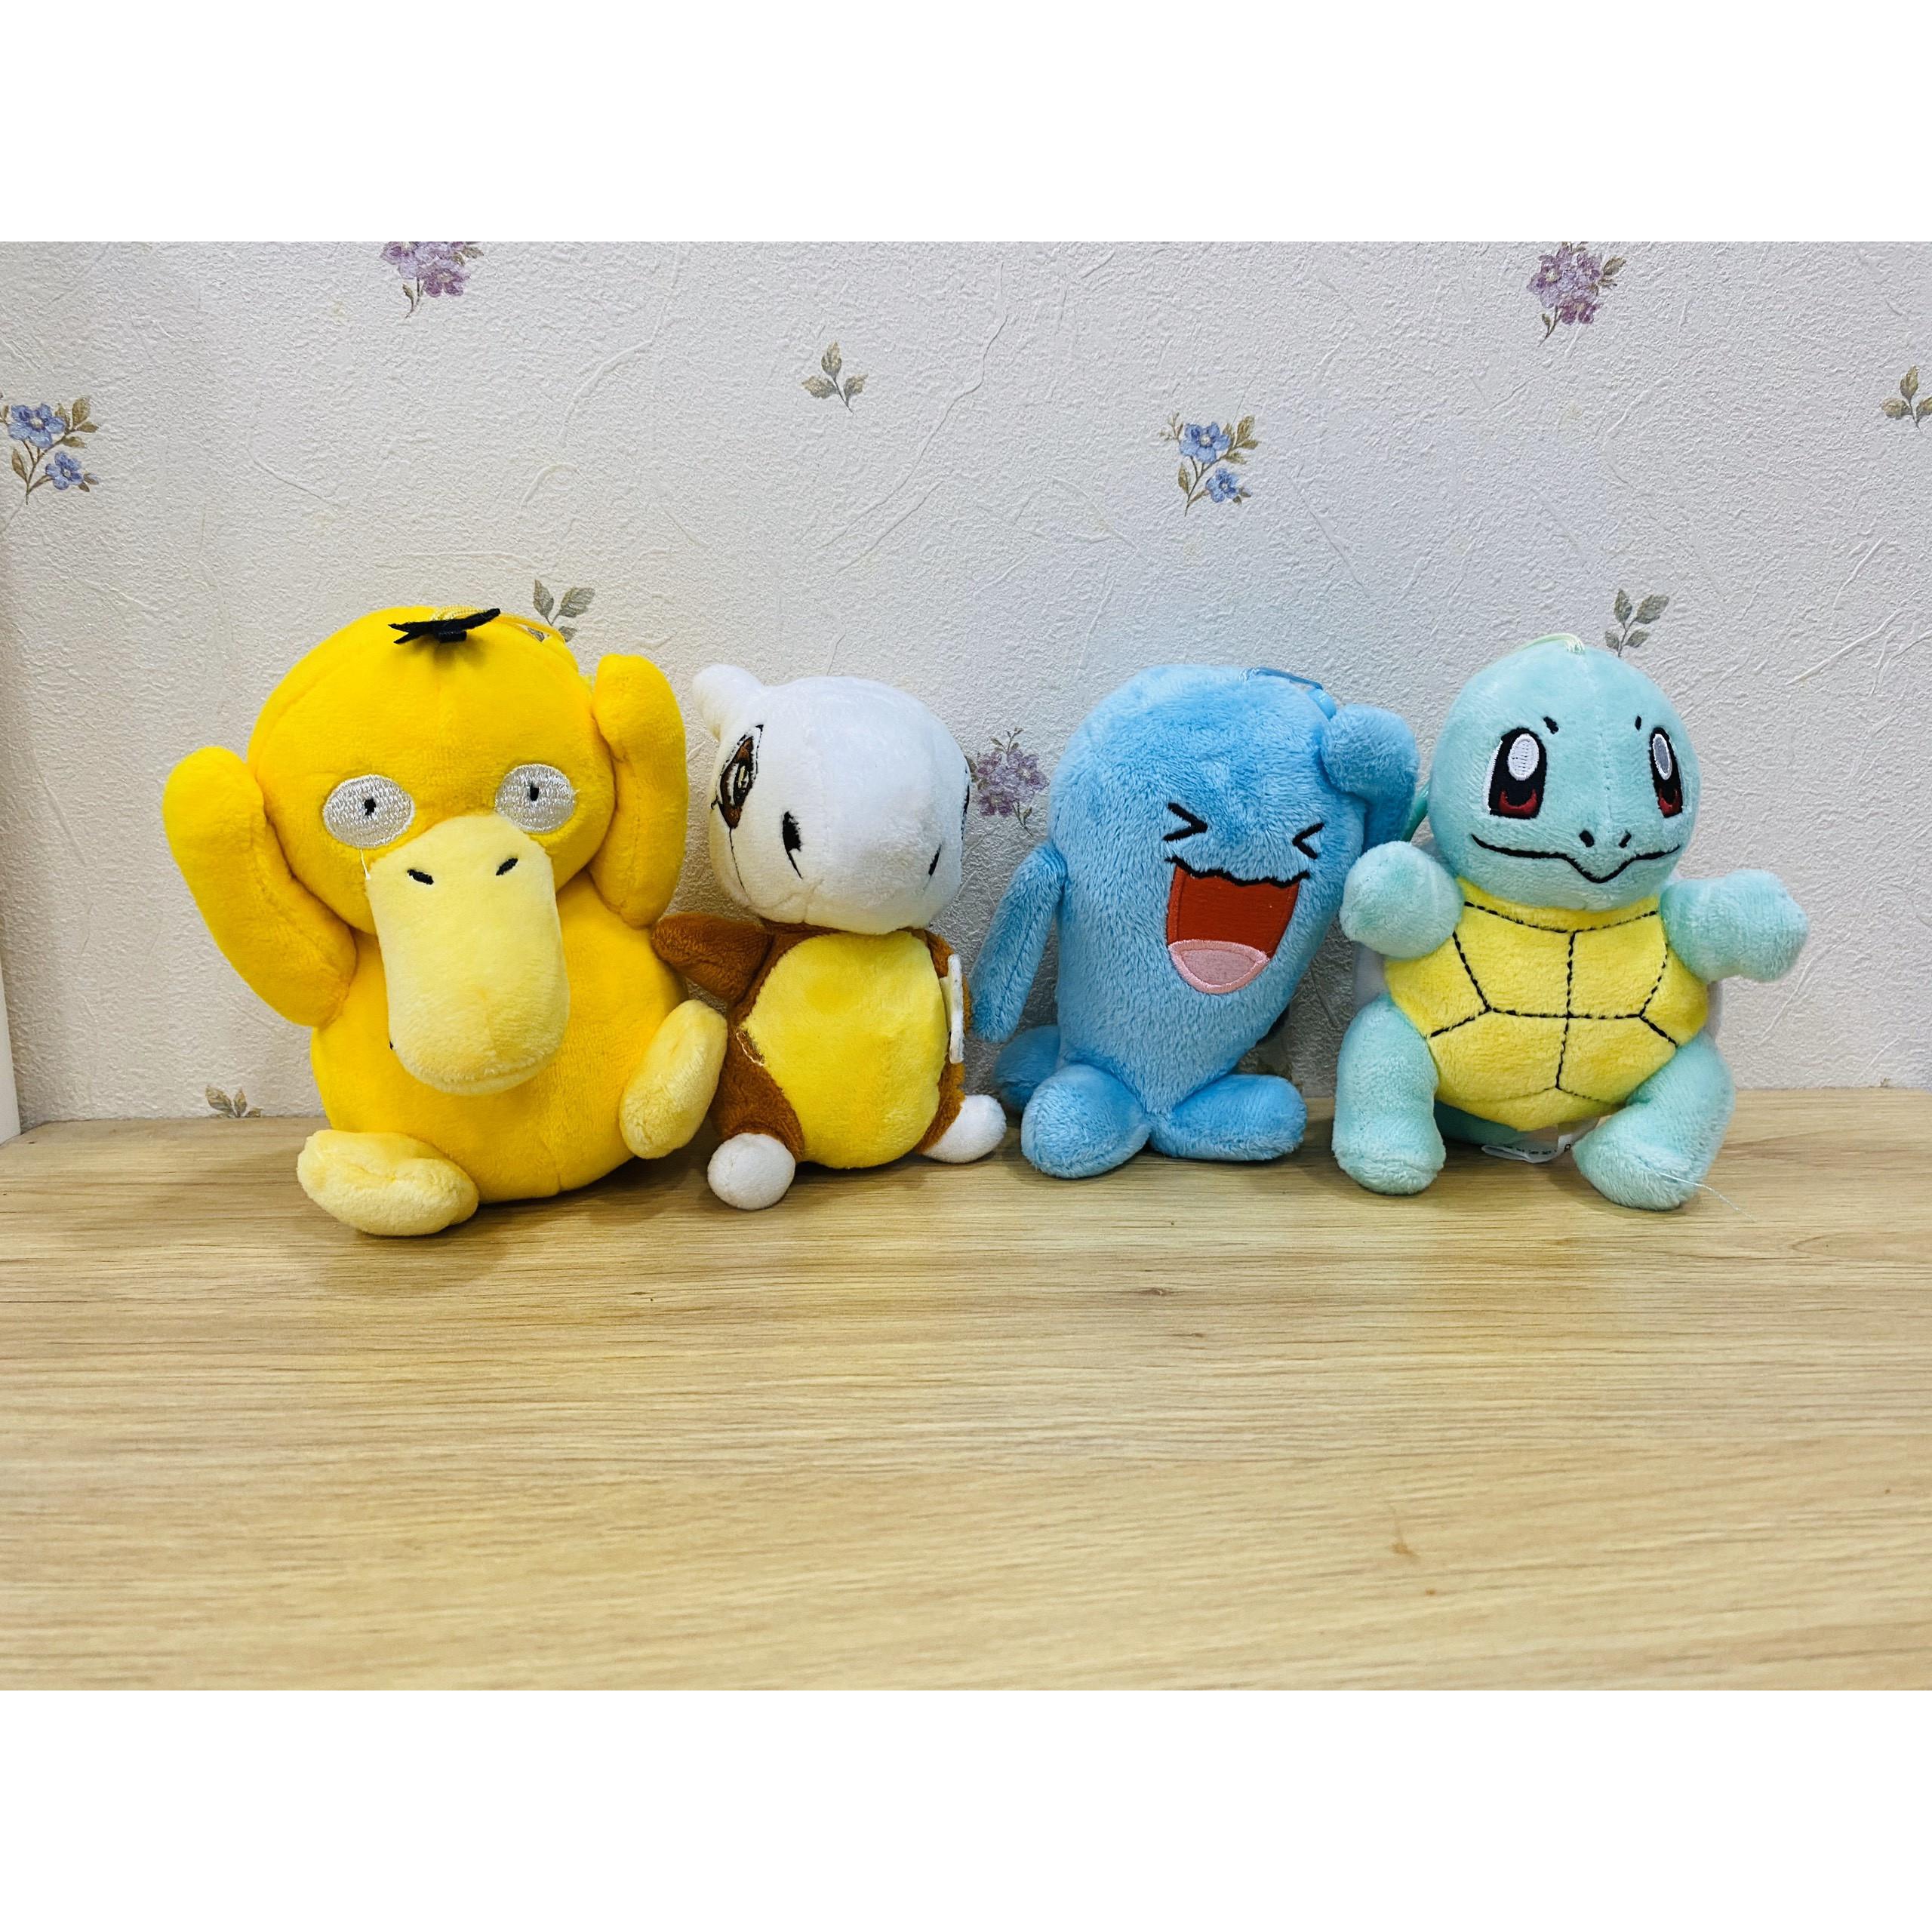 Gấu bông Pokemon Combo 3 hoặc 4 Pokemon móc khóa bất kỳ (8)